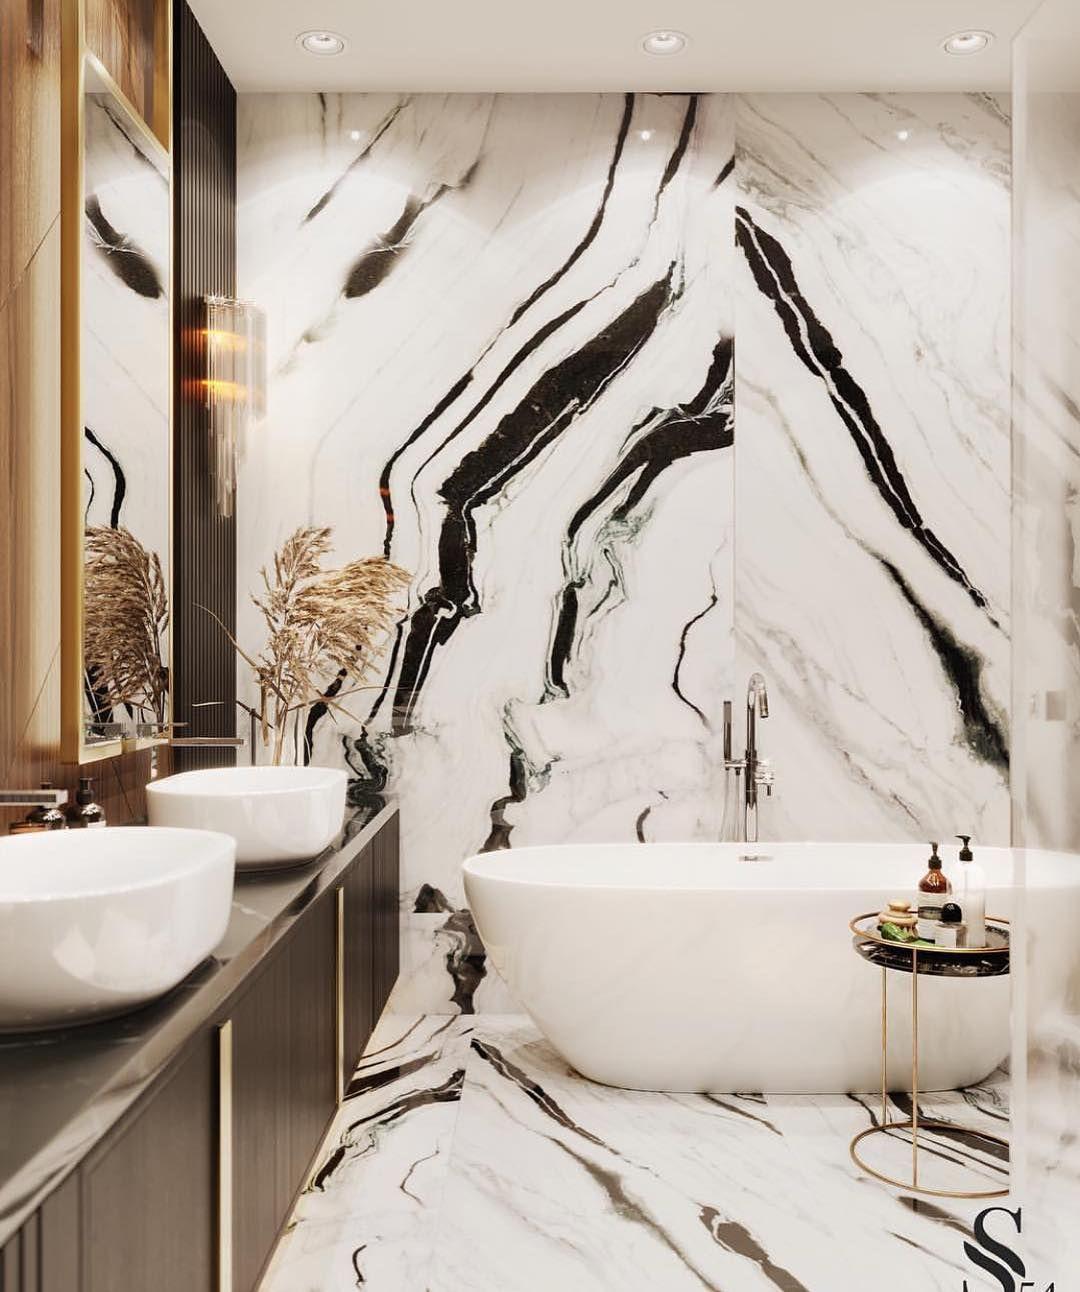 Luxury Interiordesign: Ashley Stark Kenner On Instagram: Long Day Calls For A